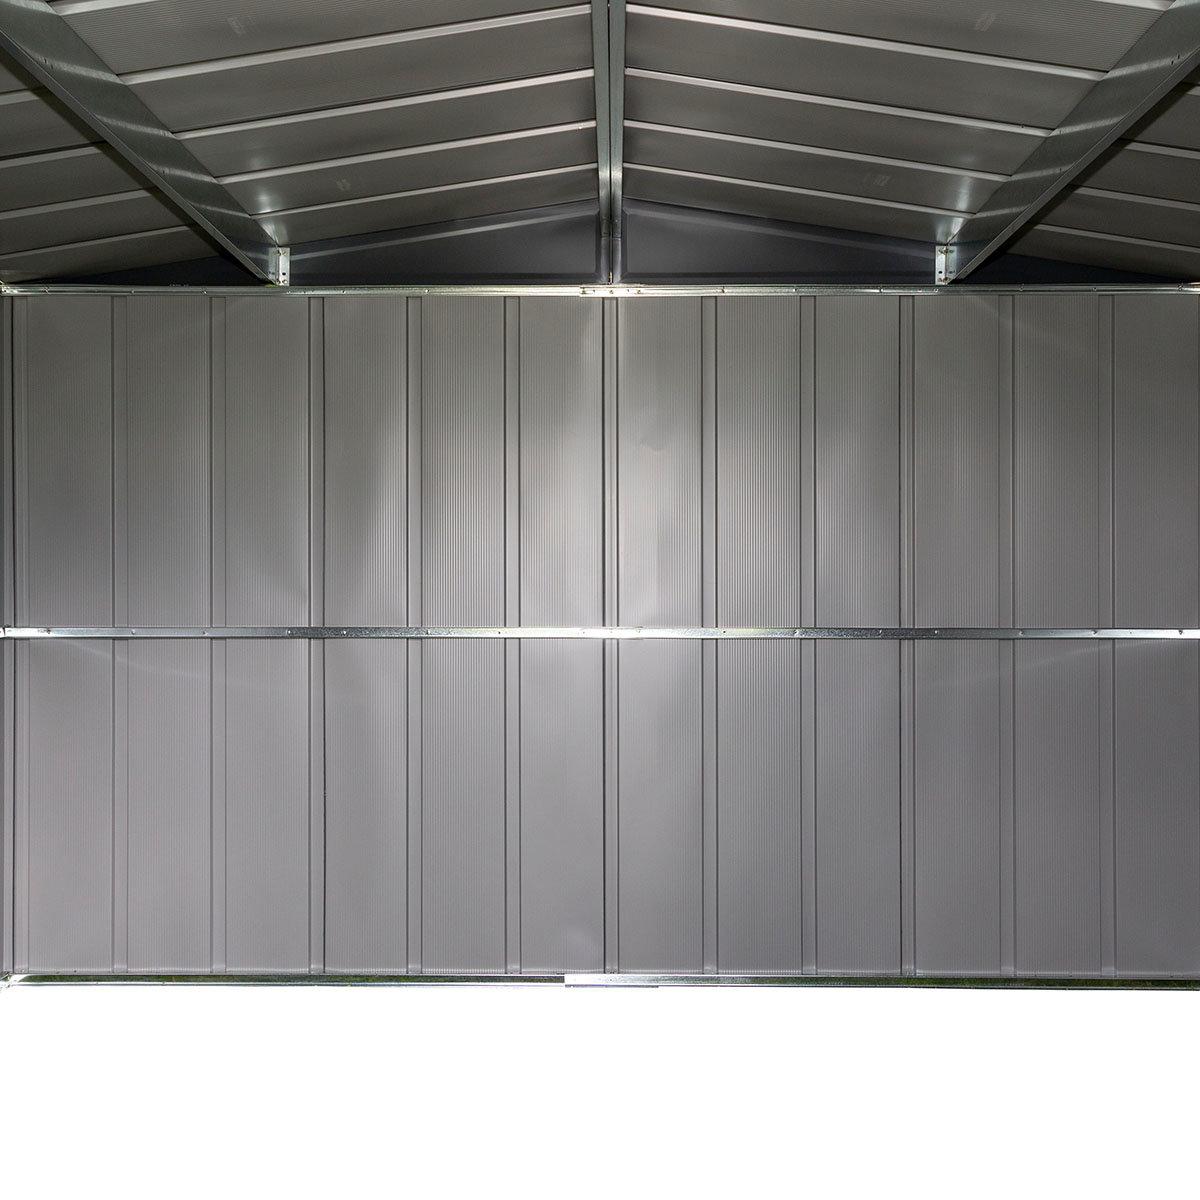 Metallgerätehaus Satteldach 10x8   #10